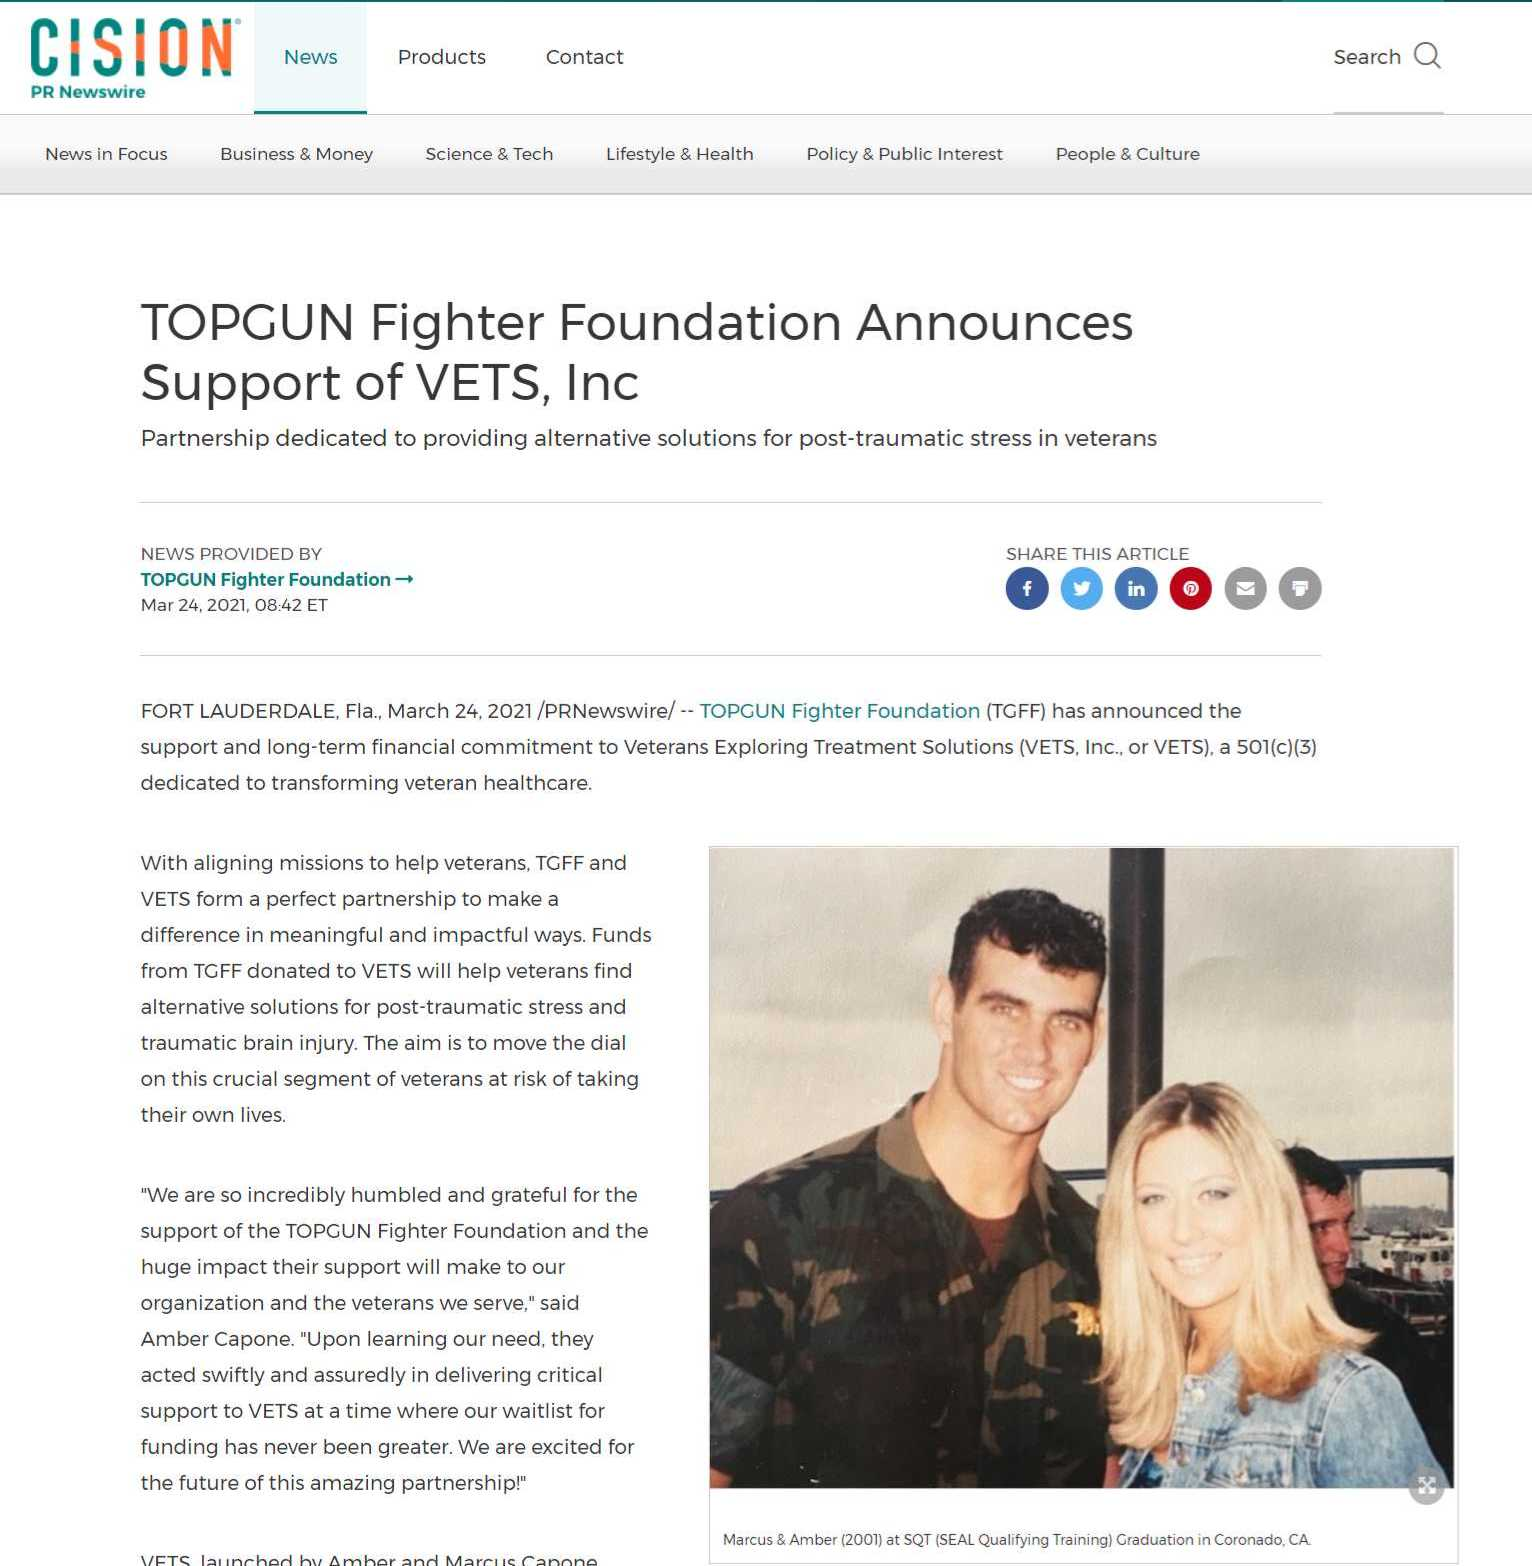 TGO Cision Newswire 12/28/20